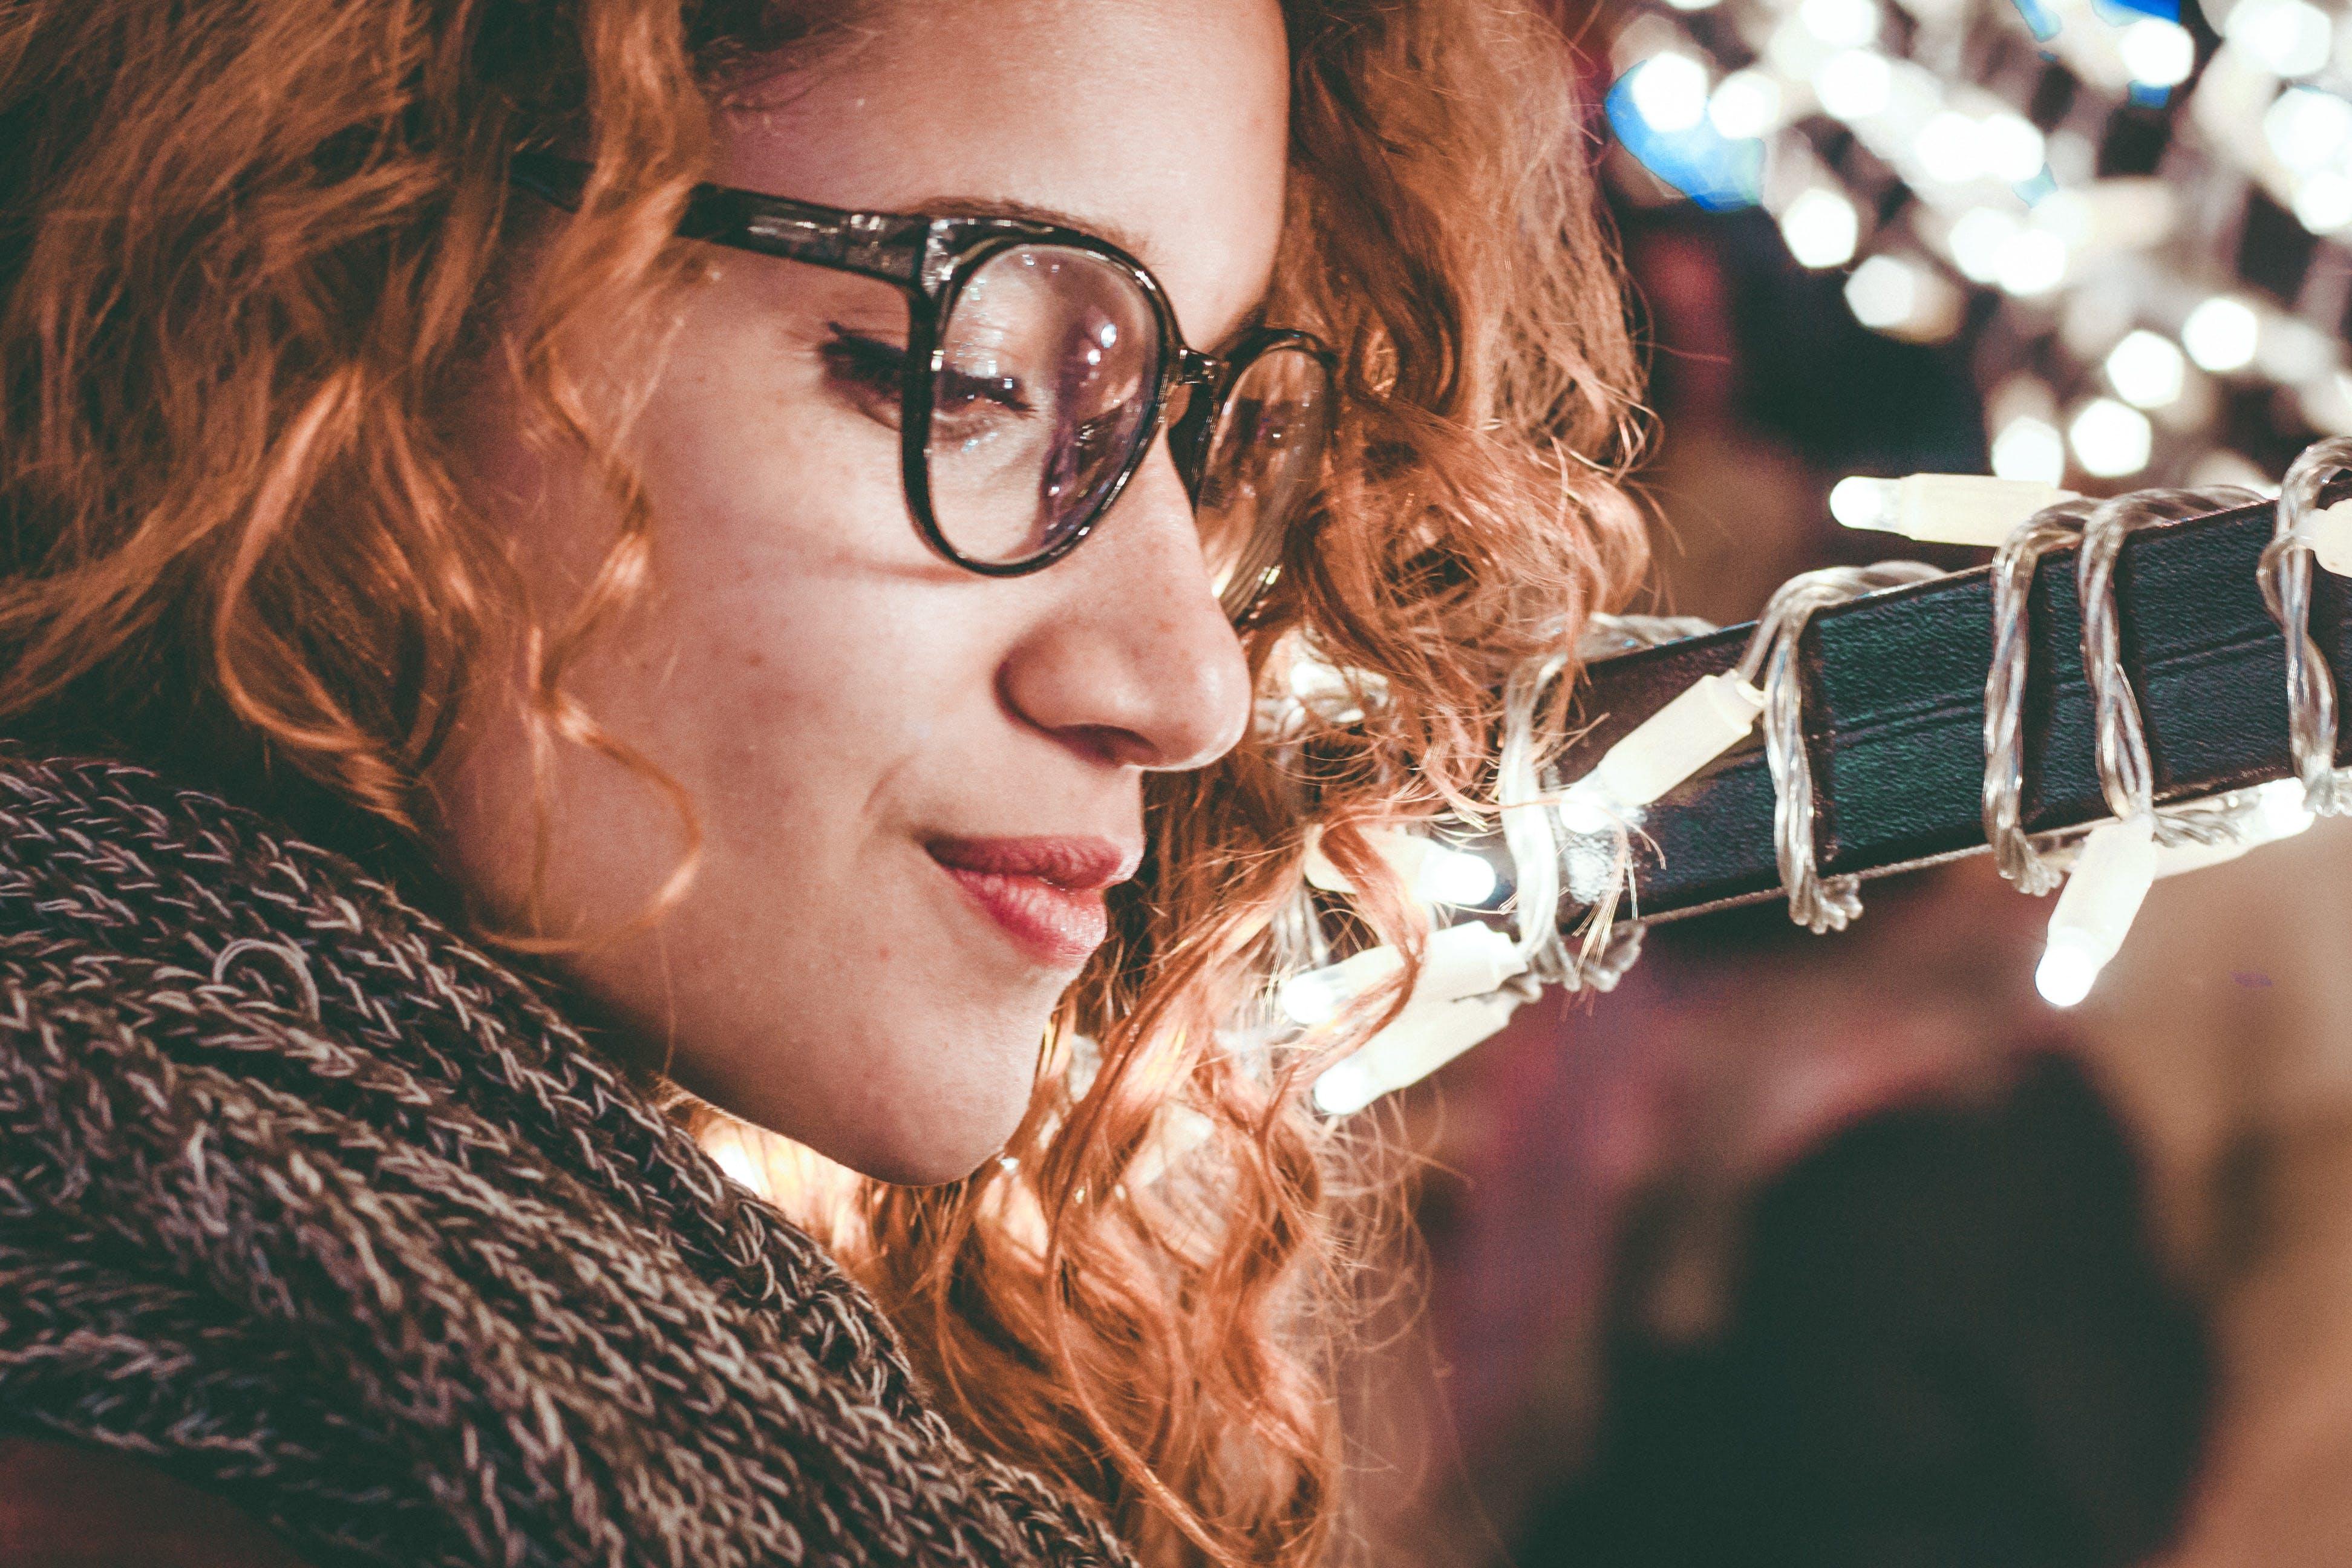 Close-Up Photo of a Woman Wearing Eyeglasses